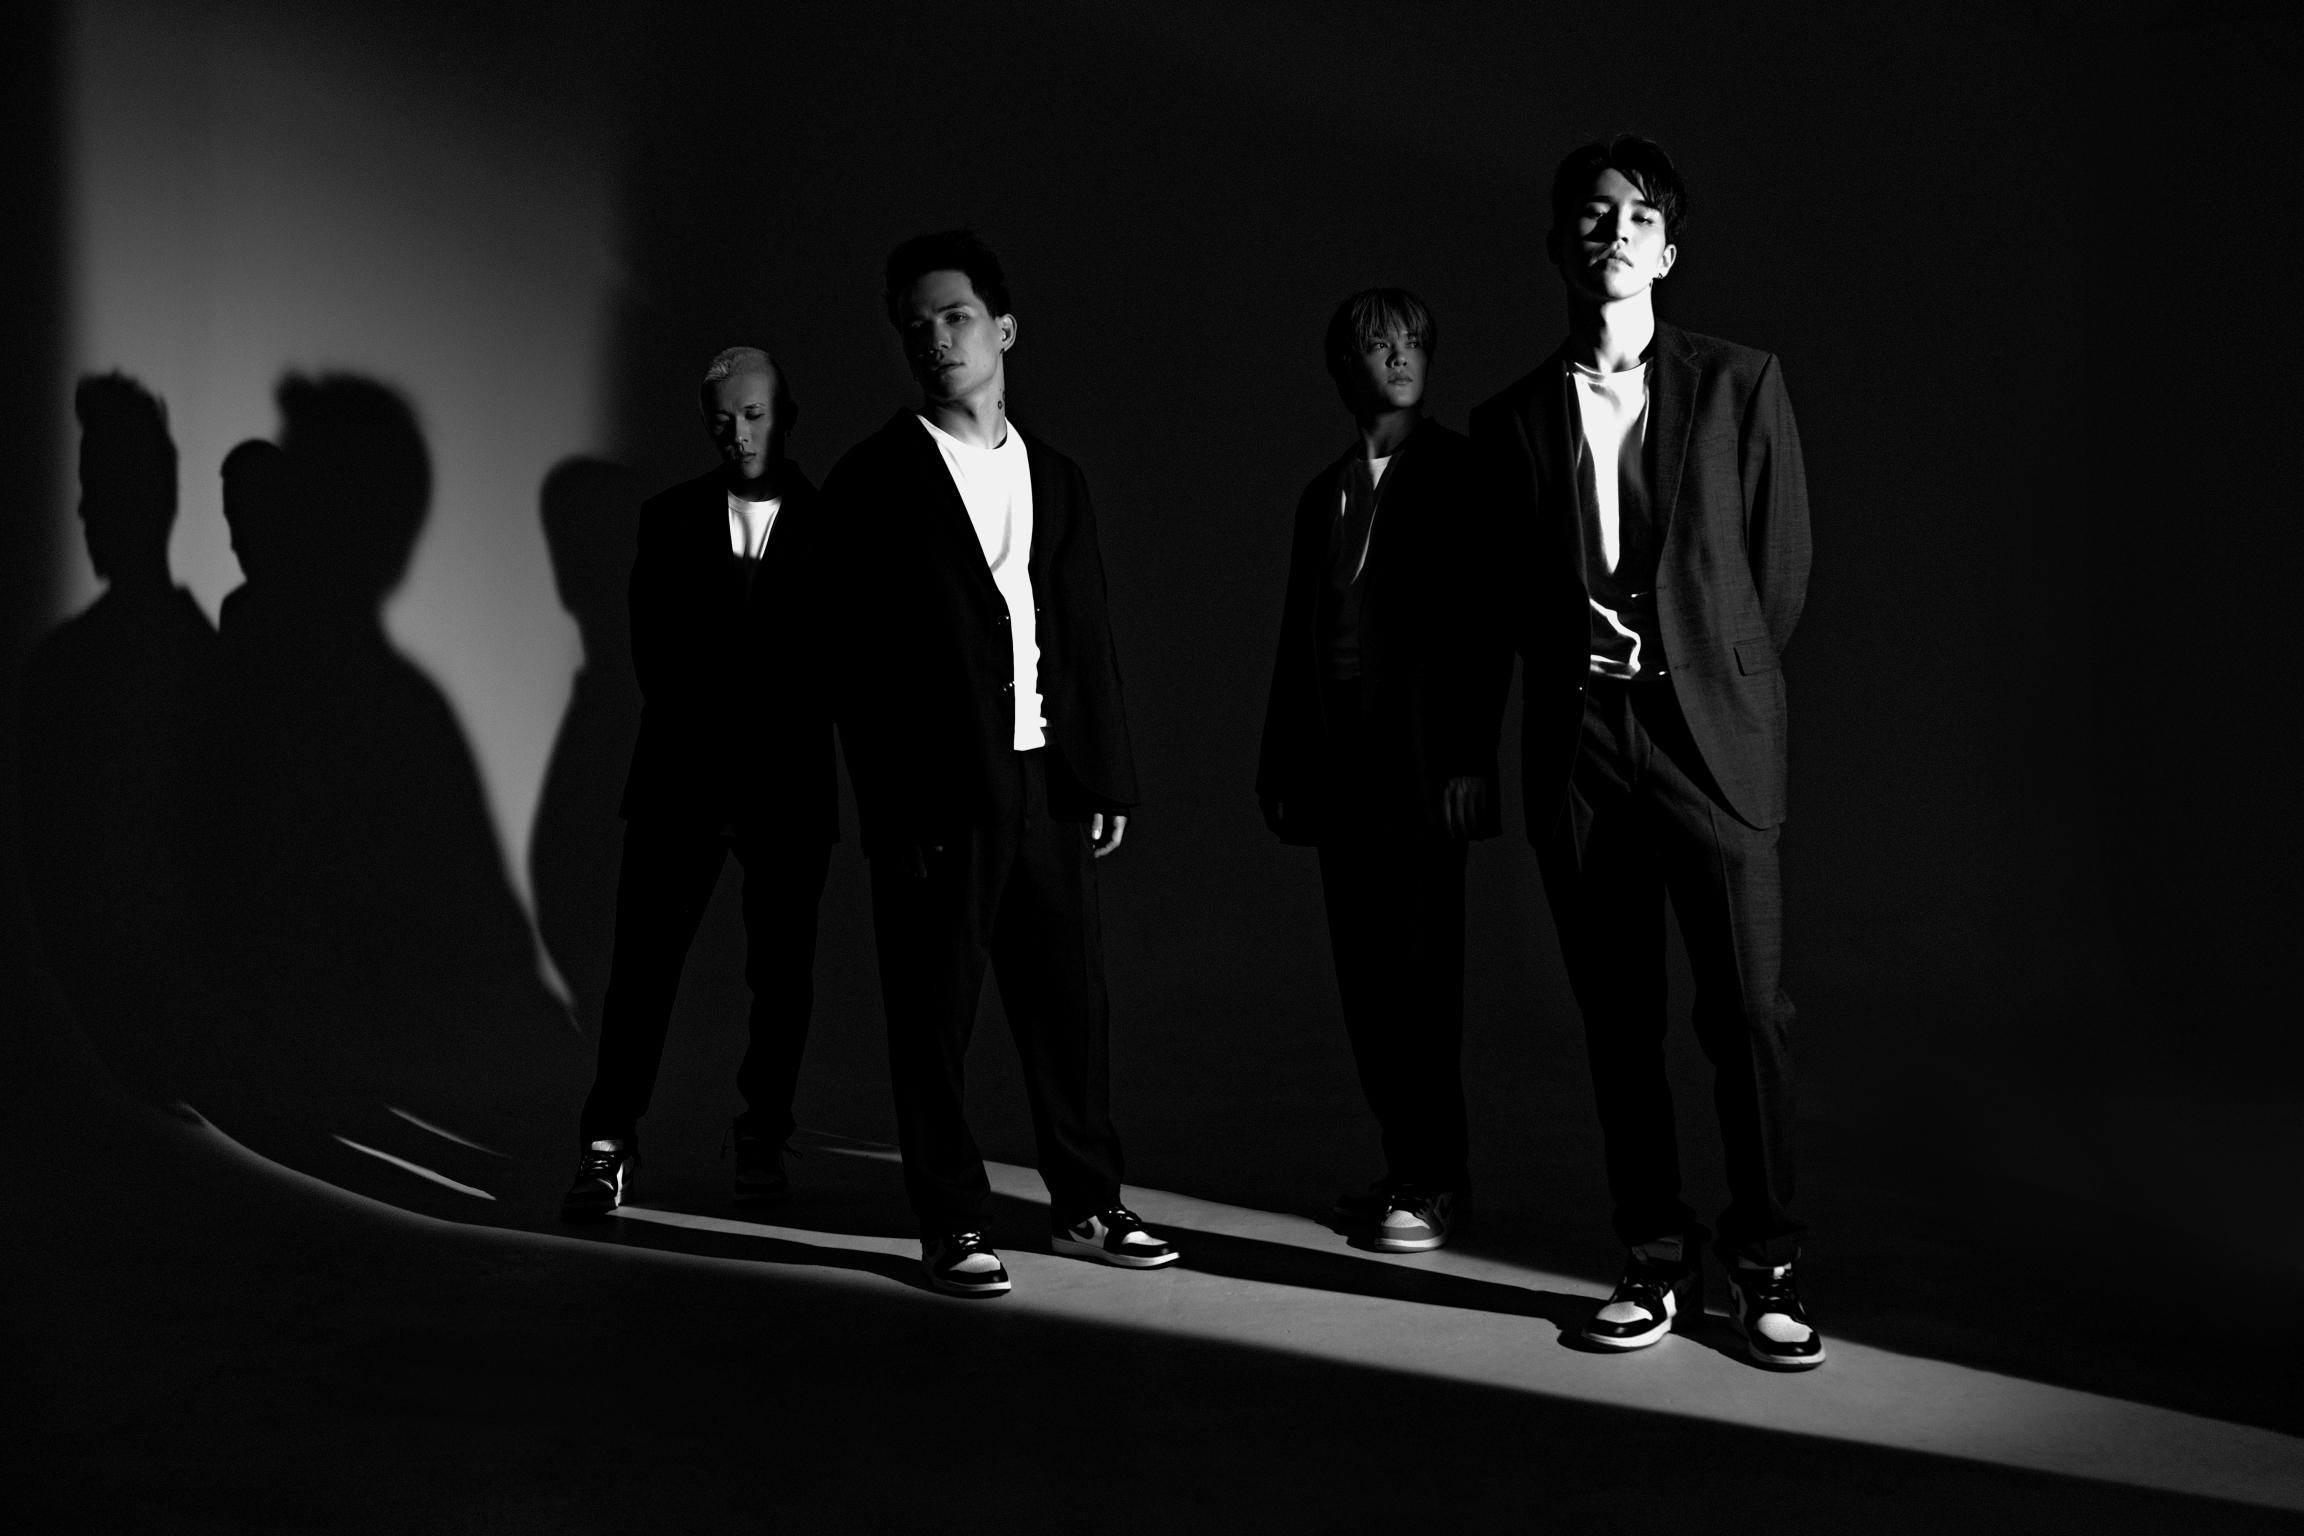 Members of Ninety One, a Q-pop boy band.